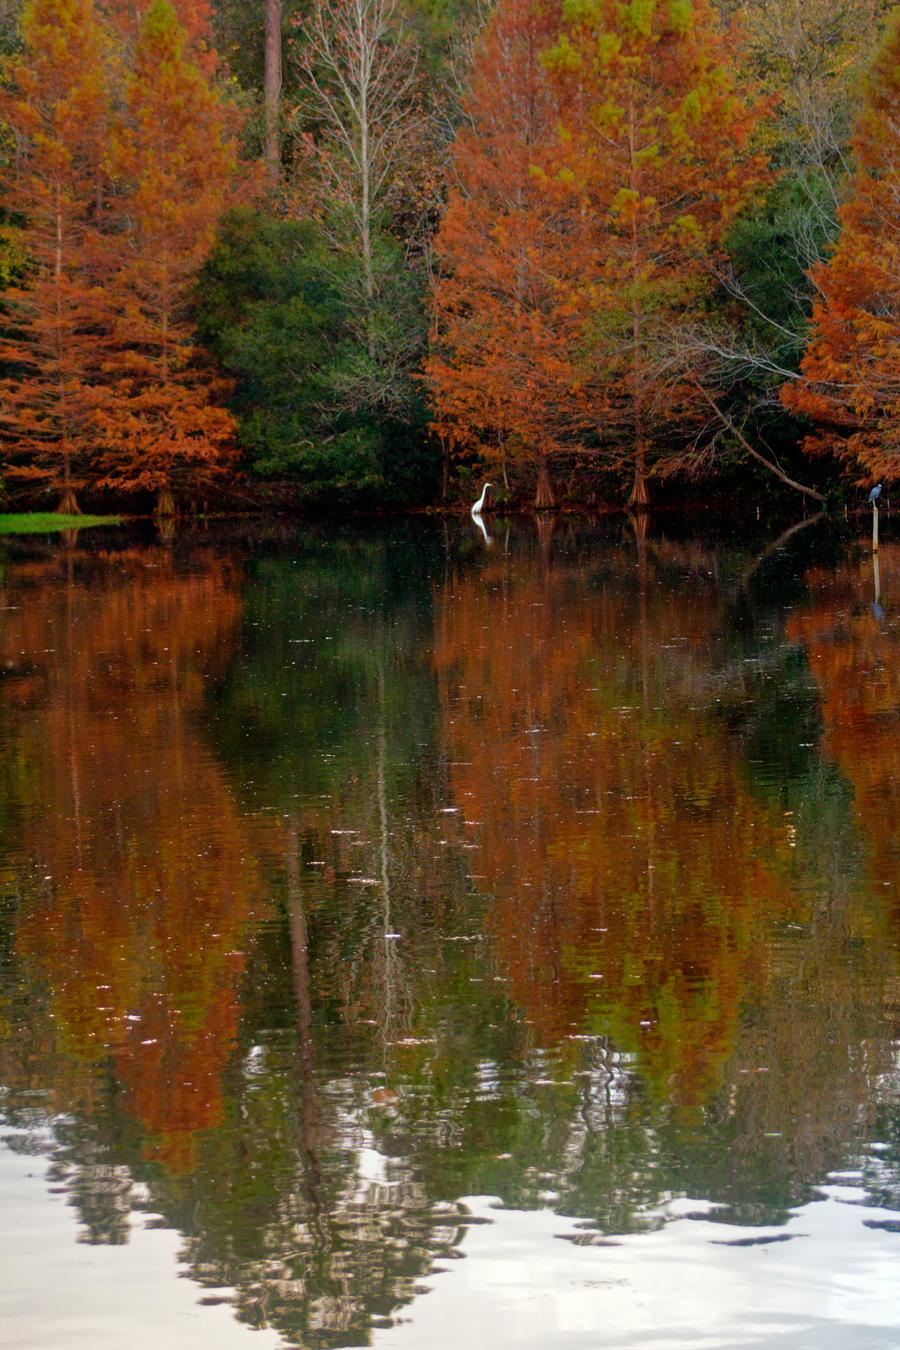 My secret fishing hole by drewii57